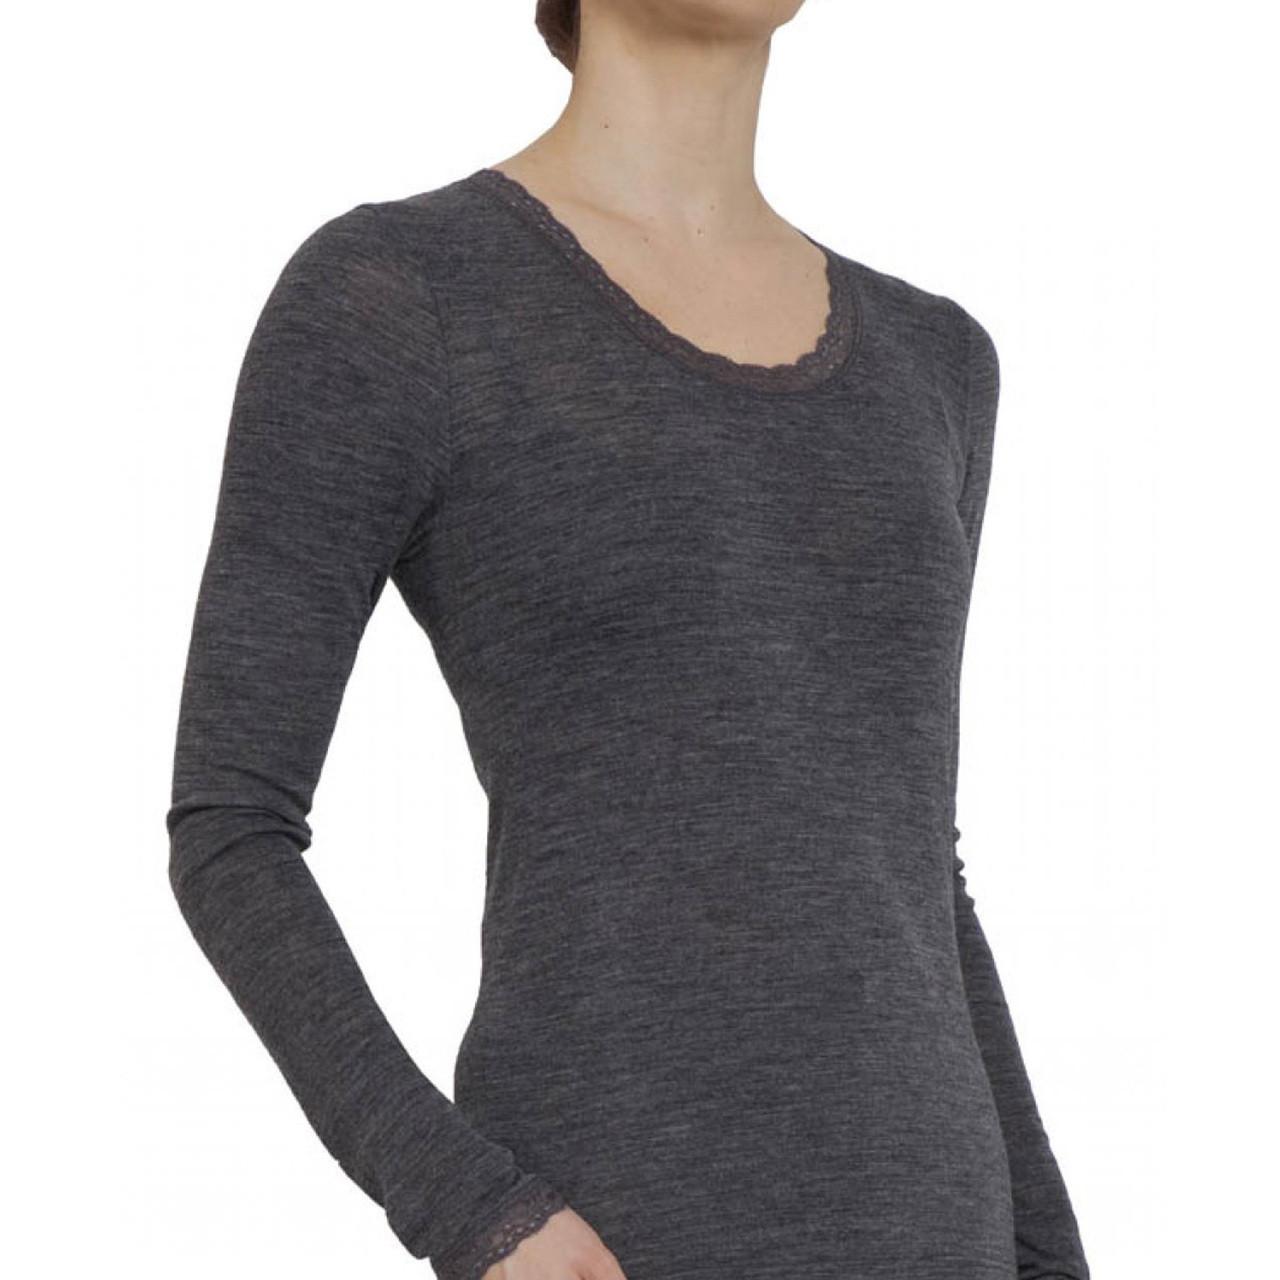 ffe0bfe4 Save on womens long sleeve thermal tshirt   merino blend   blank  undergarments